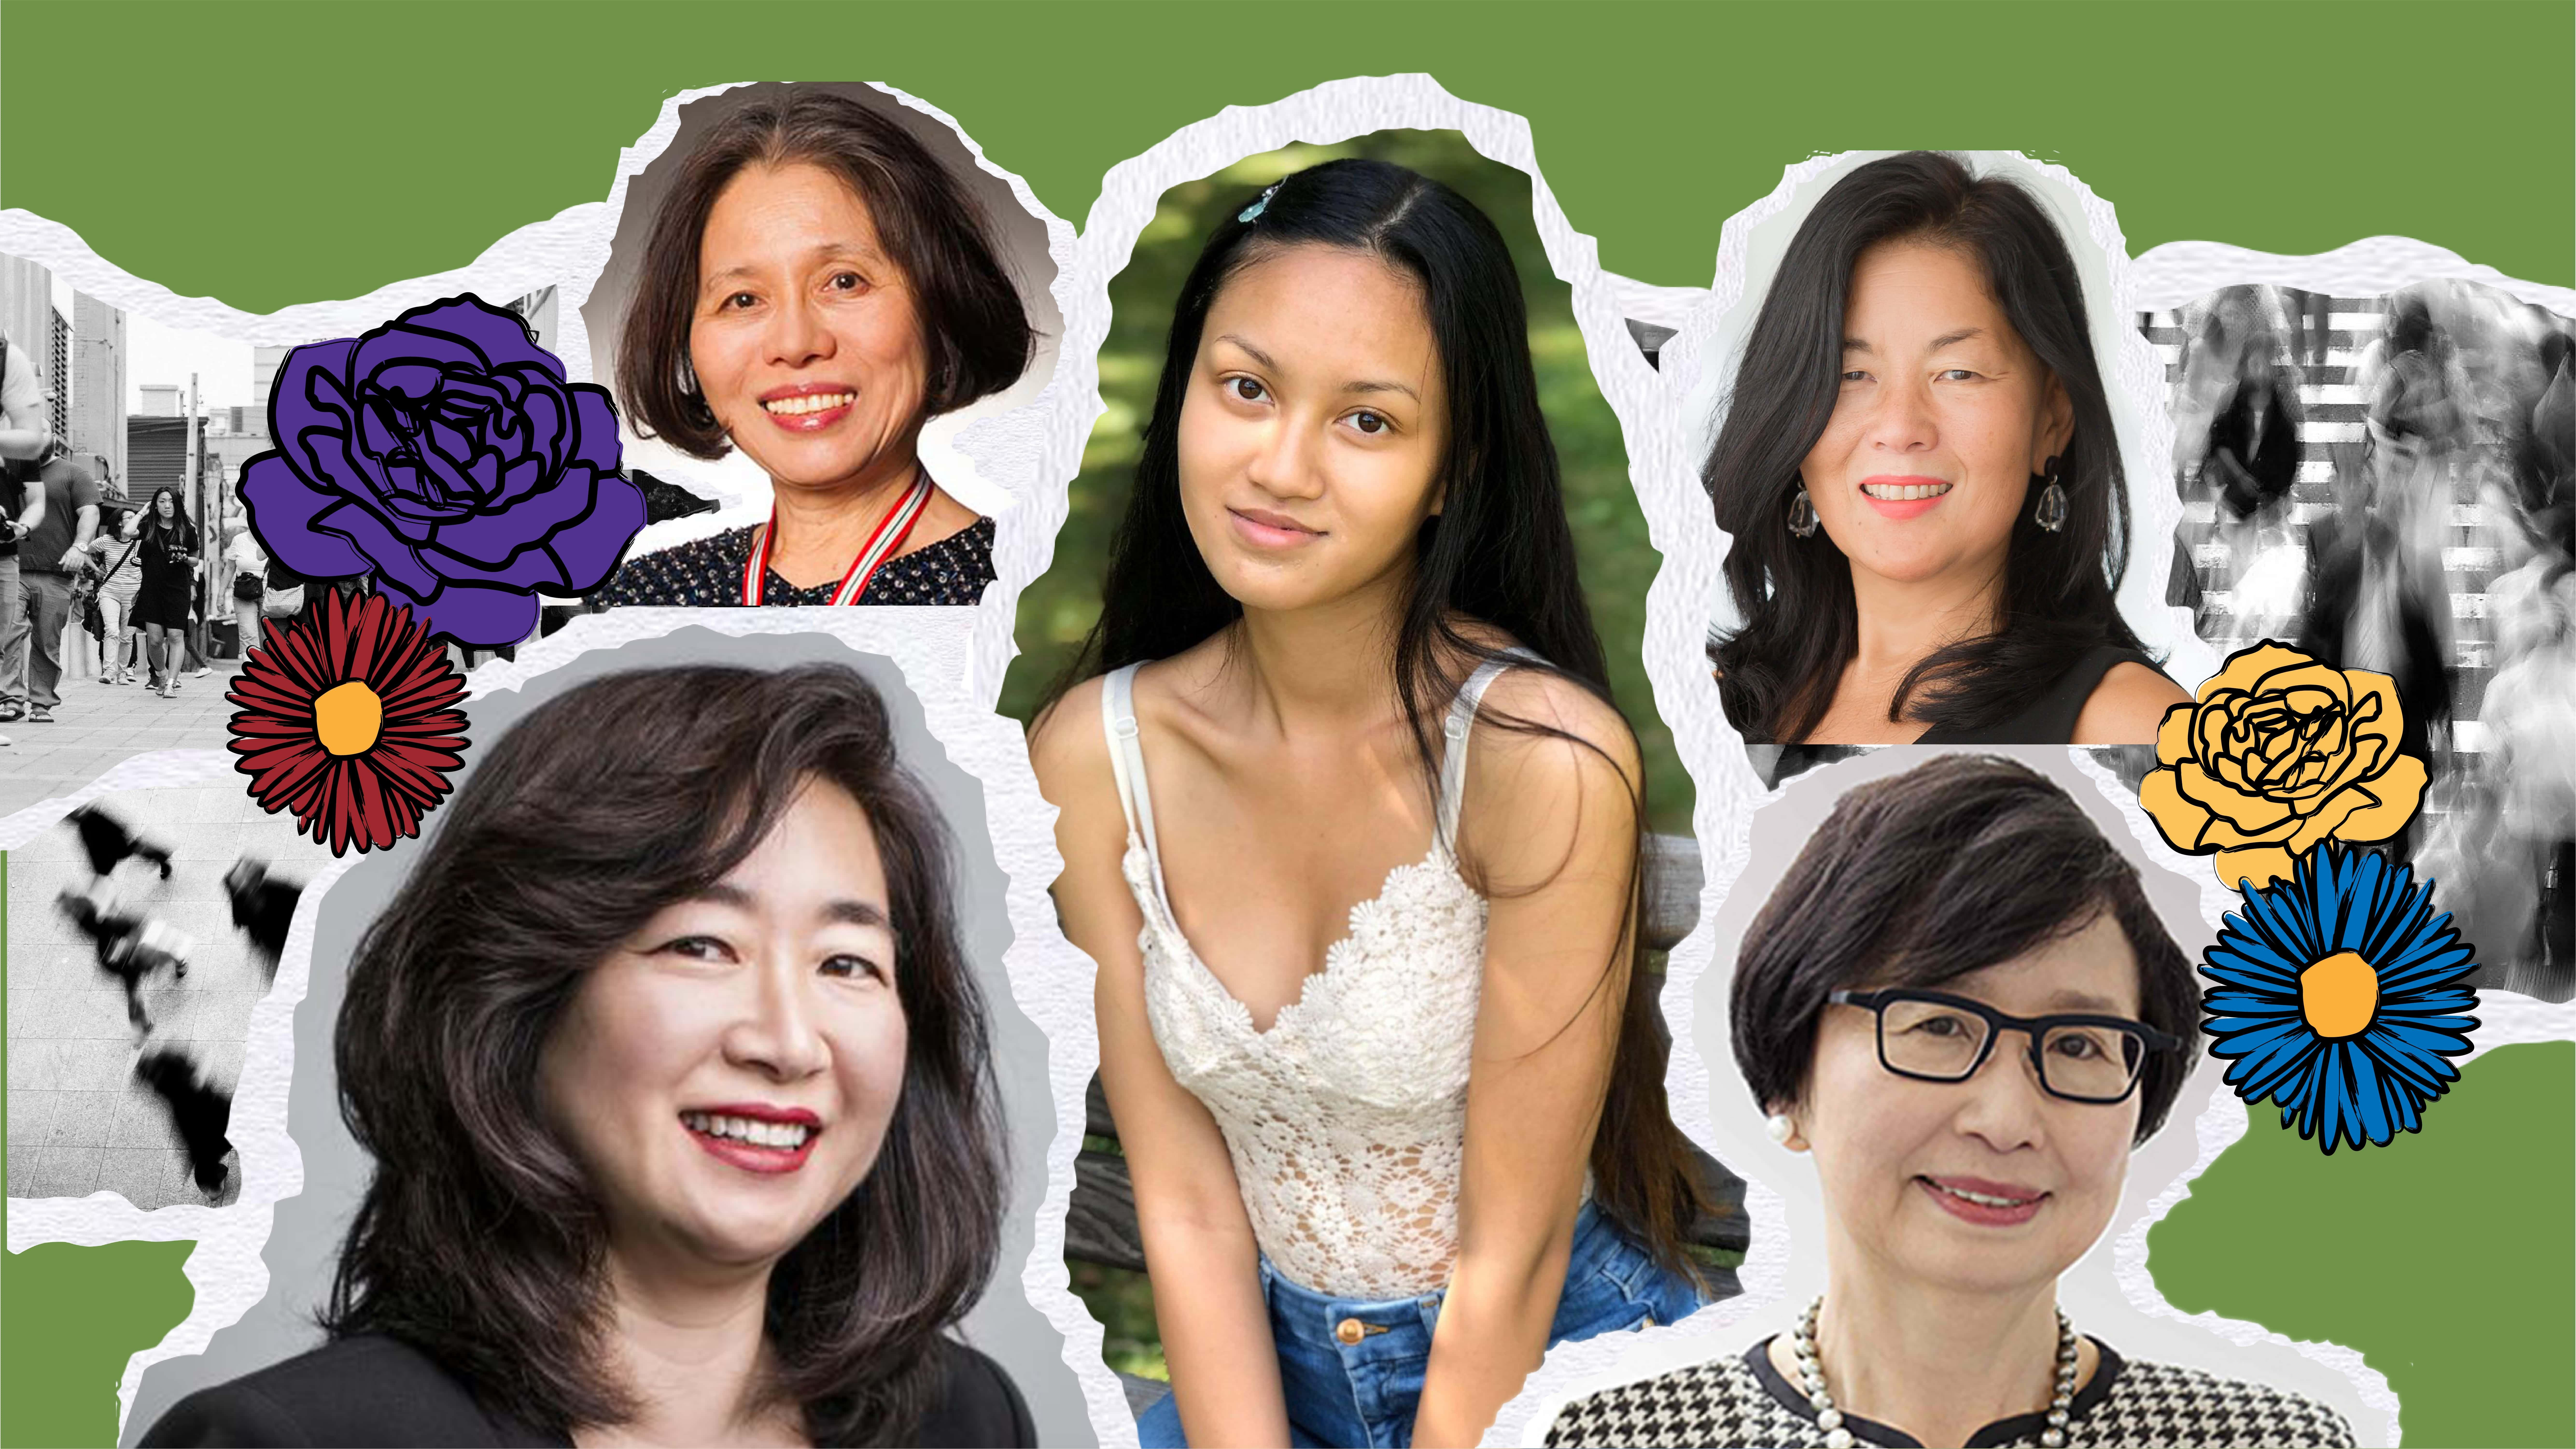 Illustration featuring Julia Shin Doi, chancellor Janice Fukakusa, Maryka Omatsu, Pamela Sugiman and Norah Kim with flowers and crowds in the background